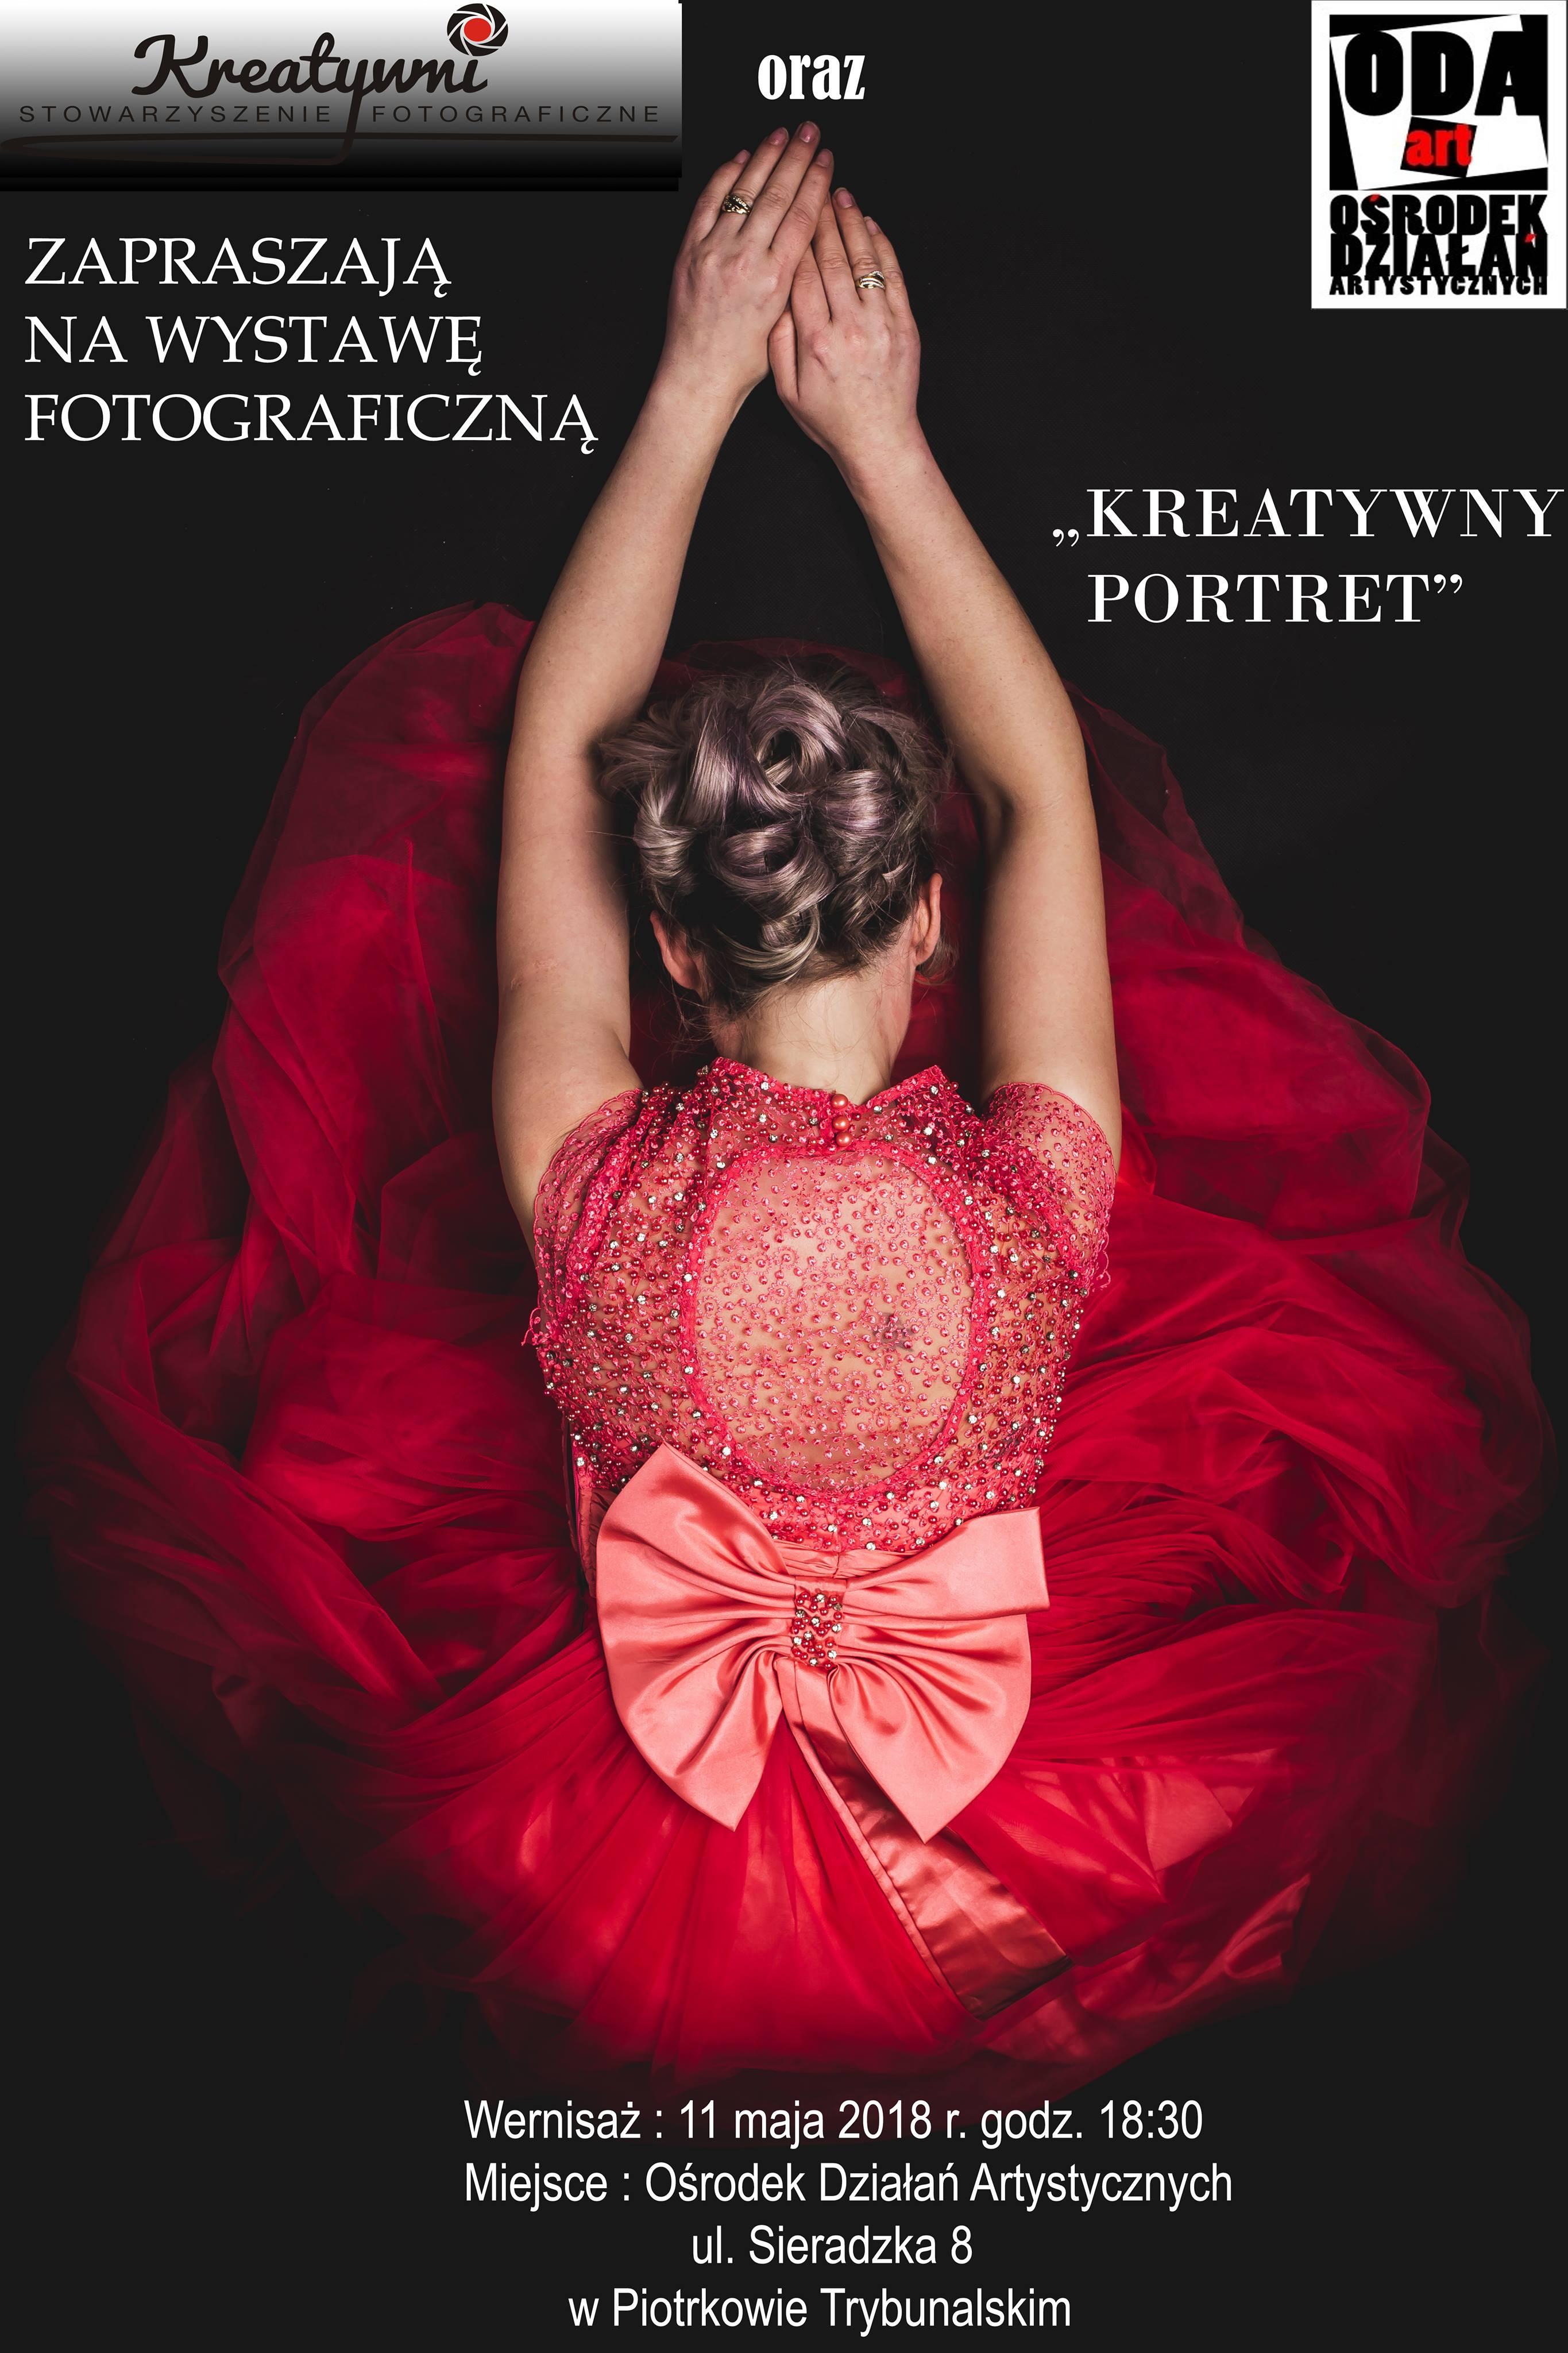 Photo of Kreatywny Portret